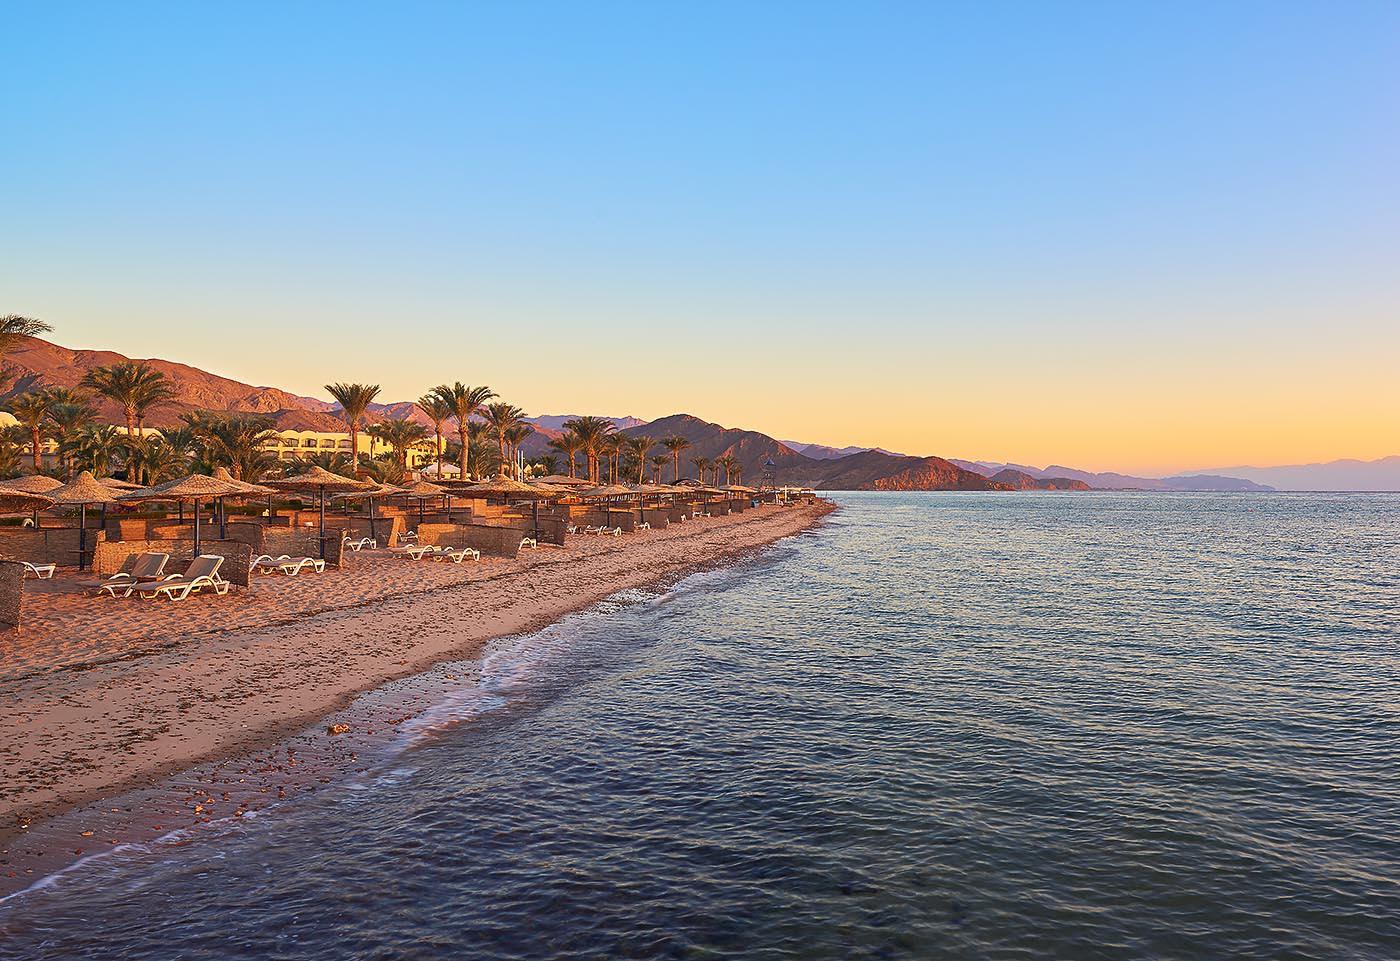 Sofitel Taba heights beach resort - Beach at morning - Mohamed Abdel-Hady Photography